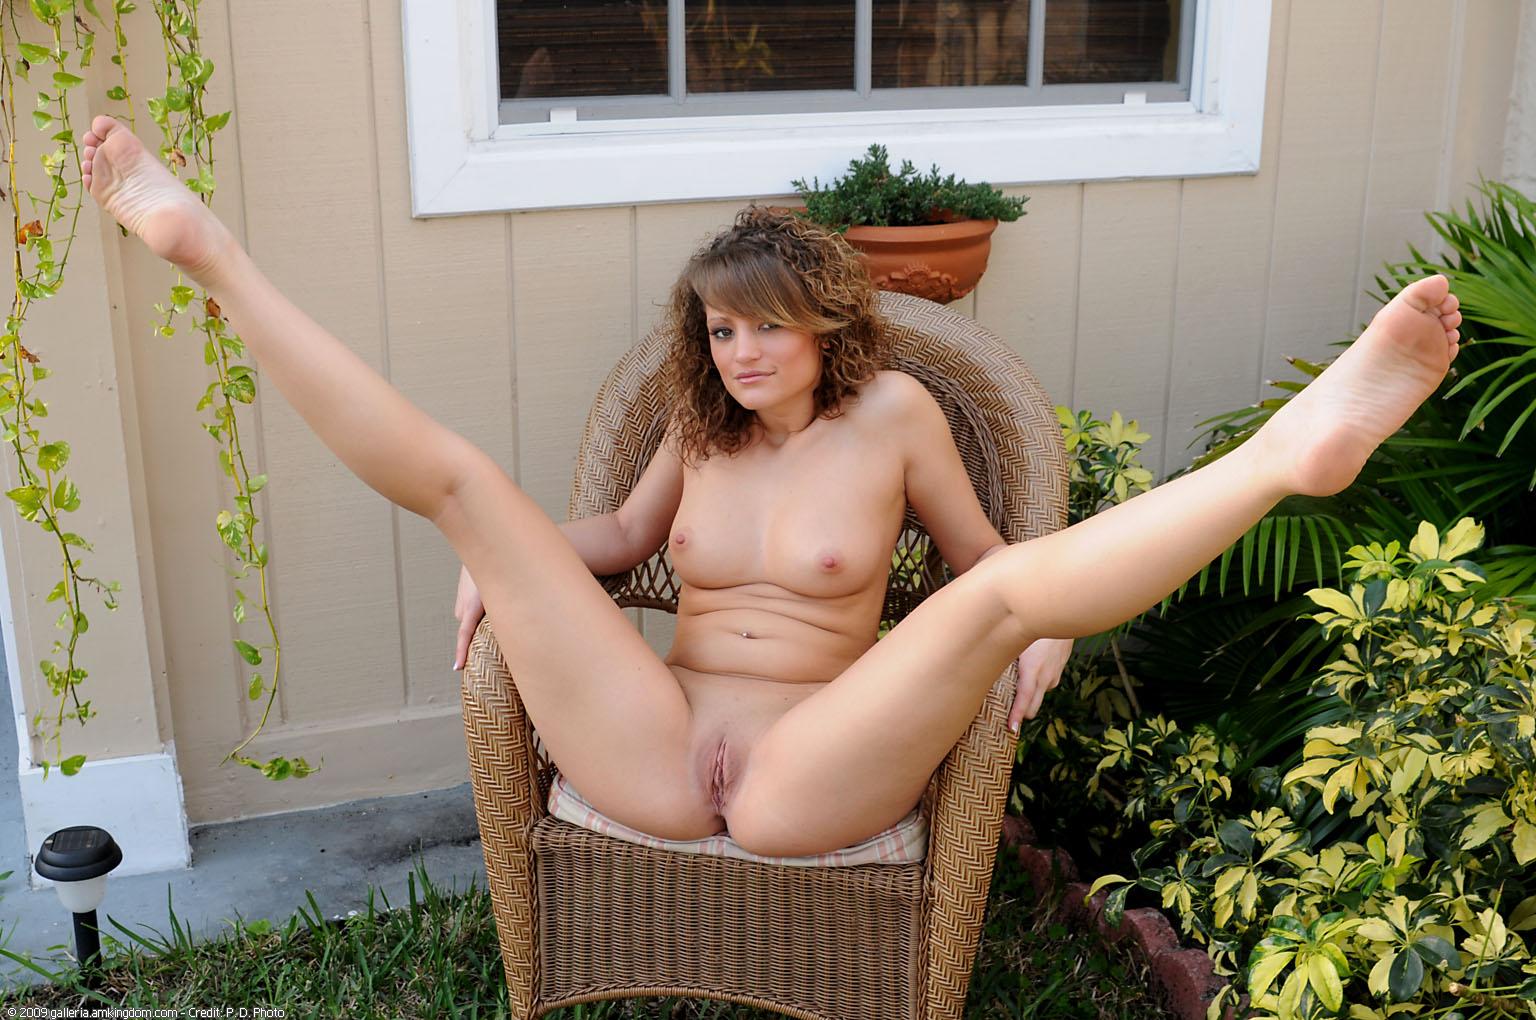 Cheyenne Cooper порнозвезда